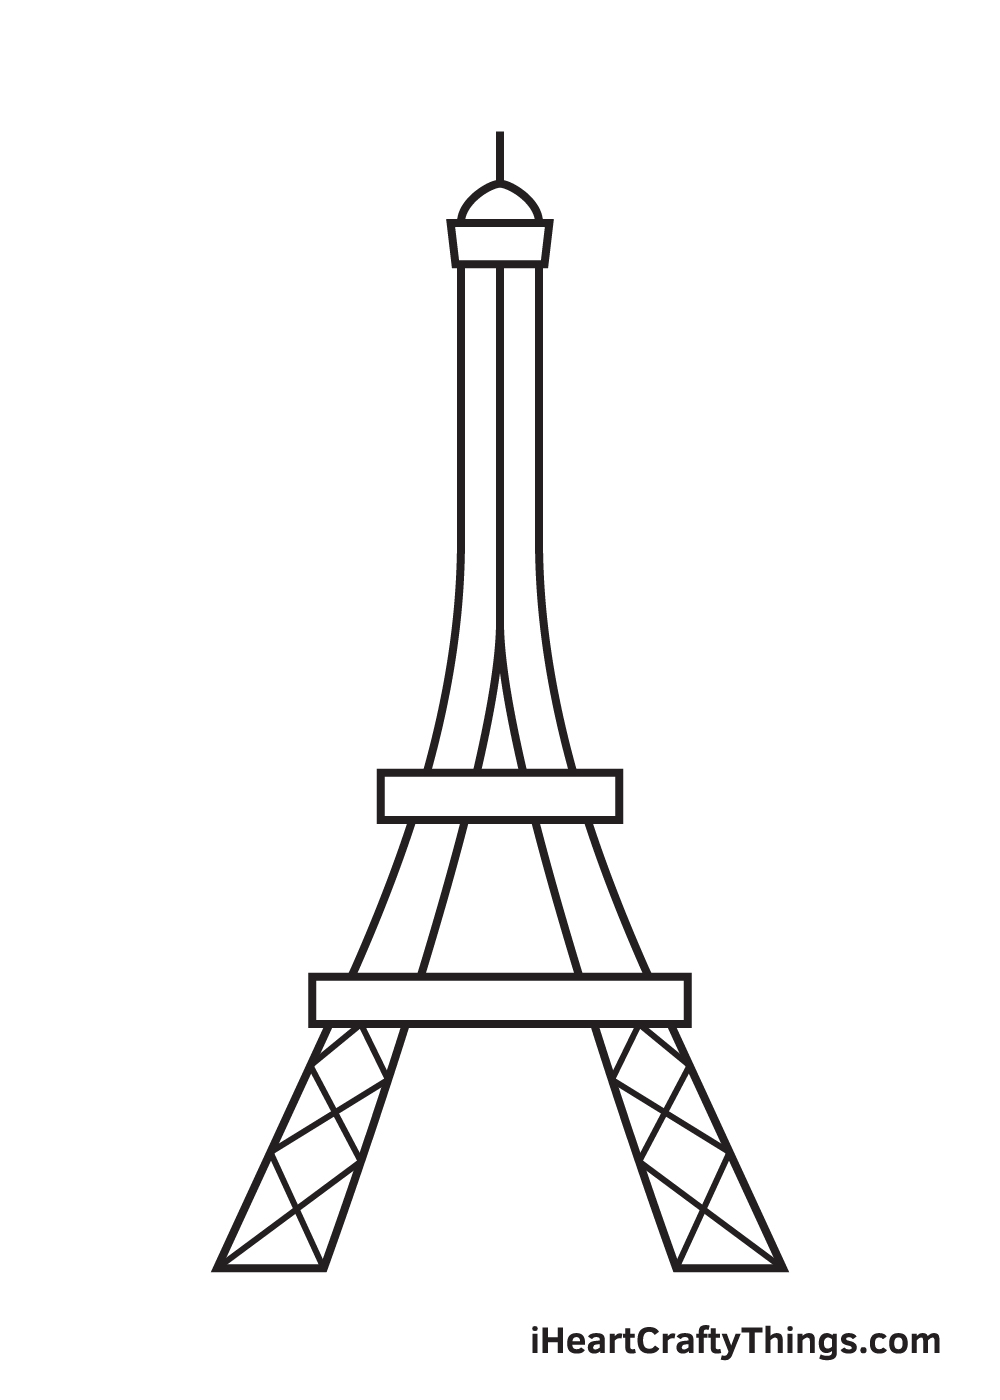 Eiffel Tower drawing - step 6